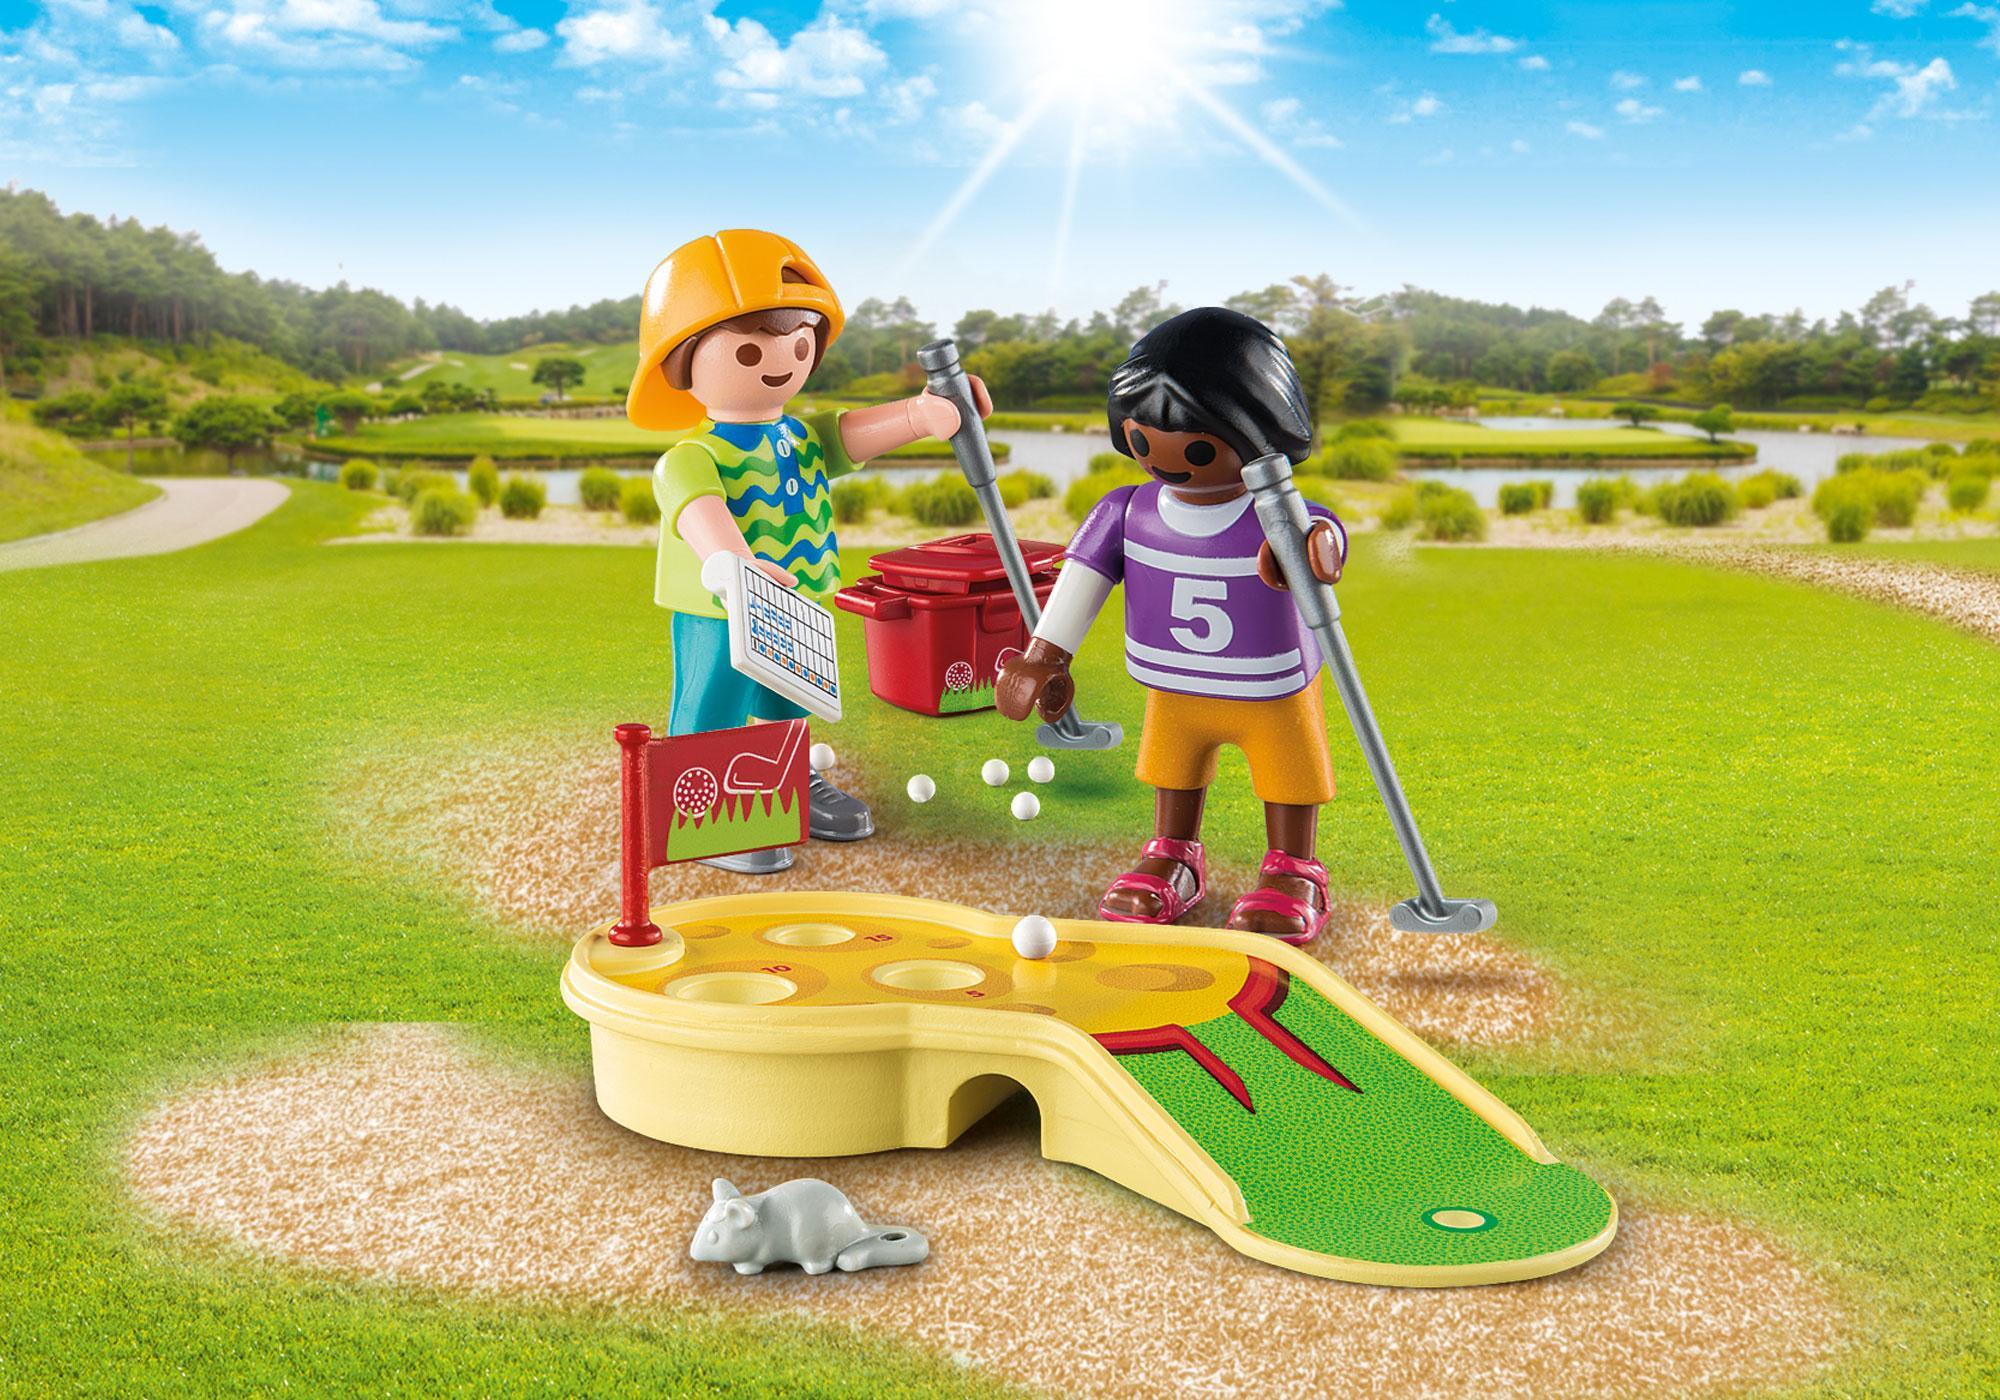 9439_product_detail/Παιδικό μίνι γκολφ